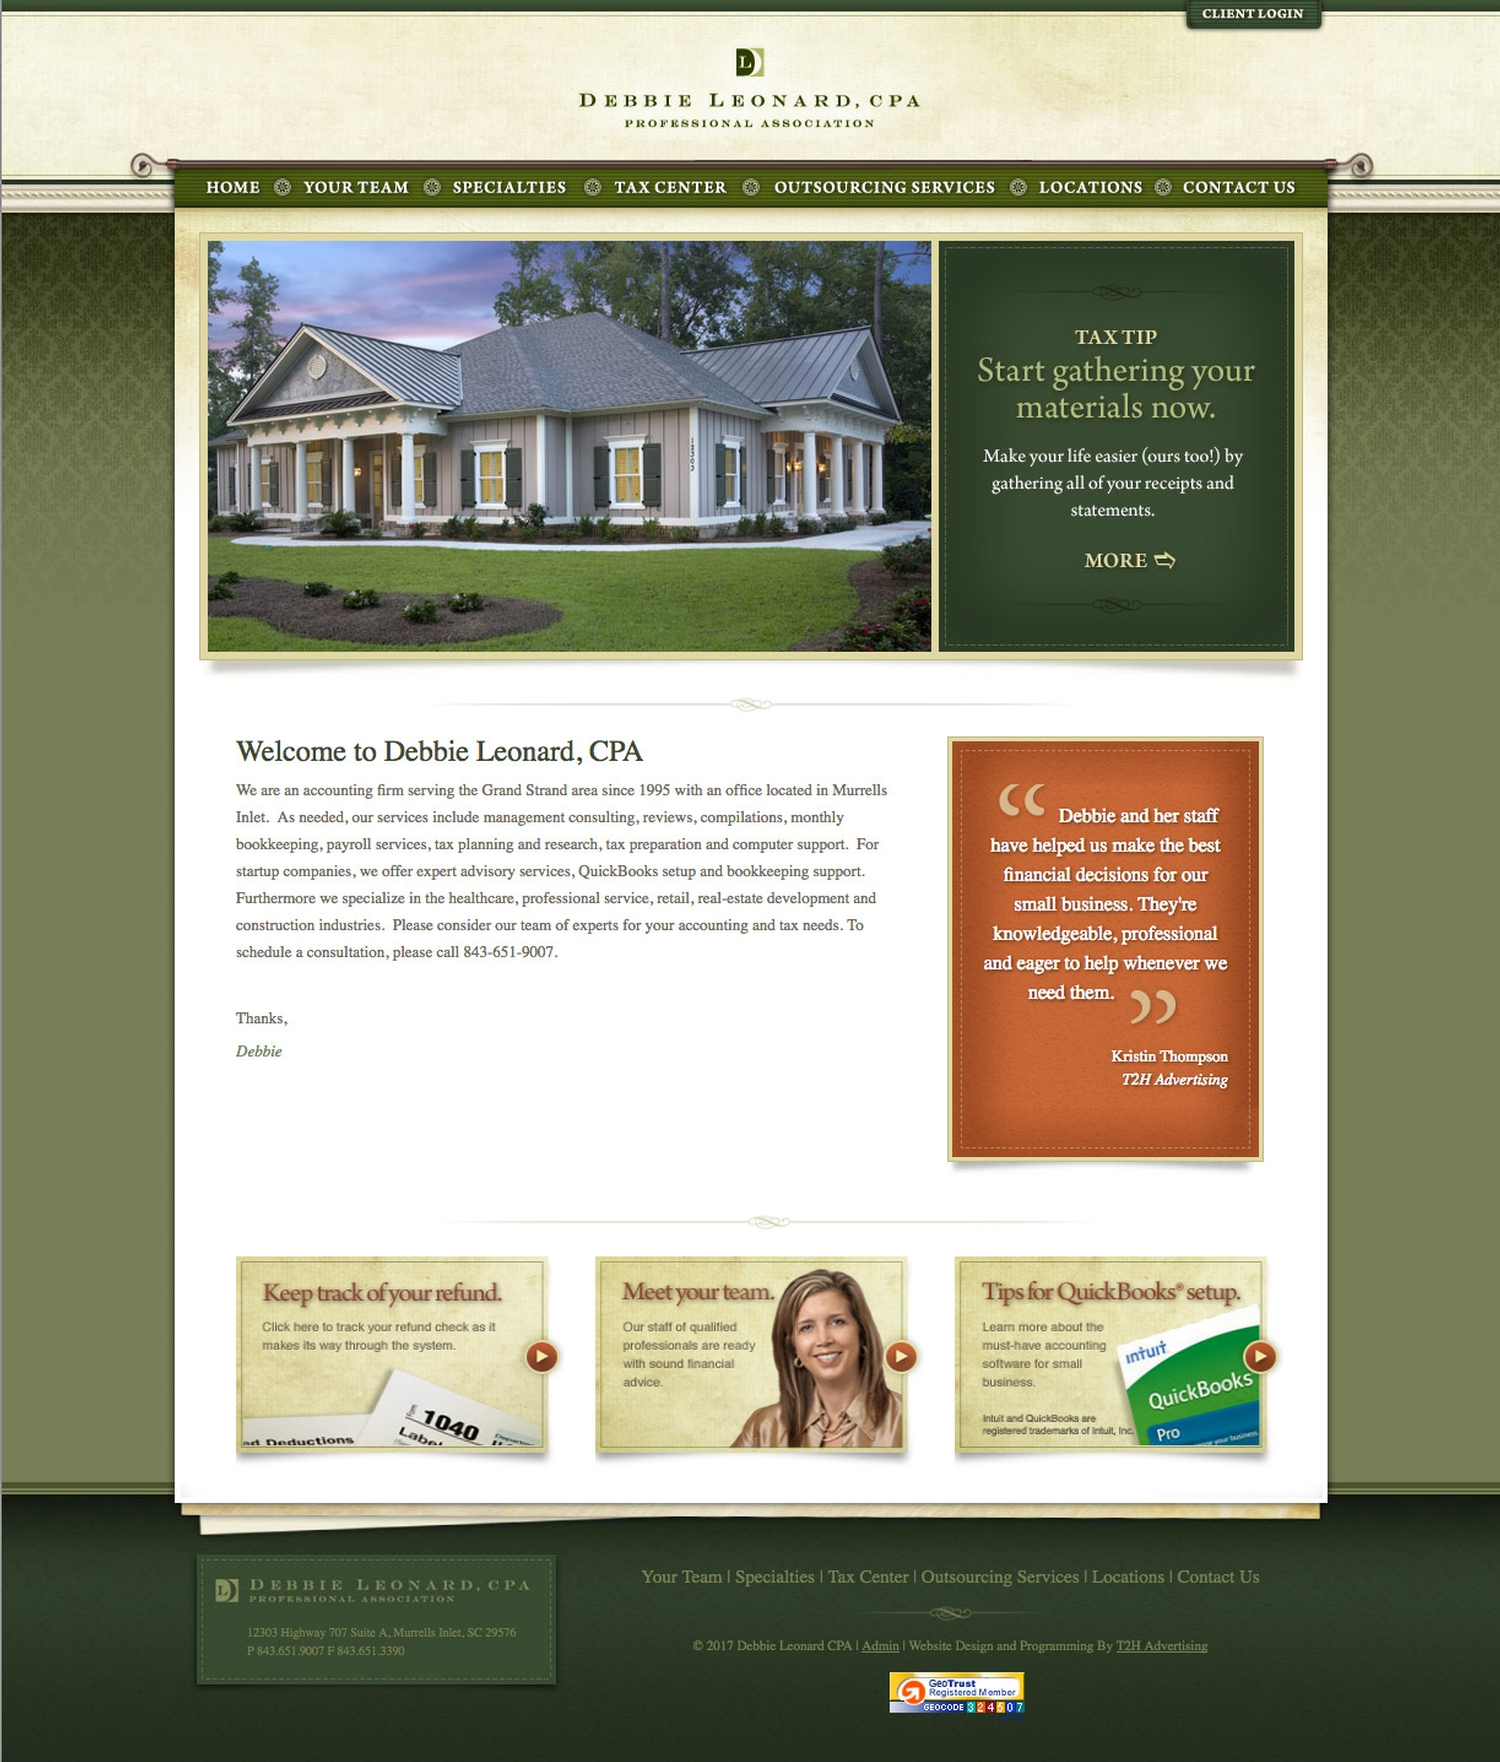 Debbie Leonard CPA Website